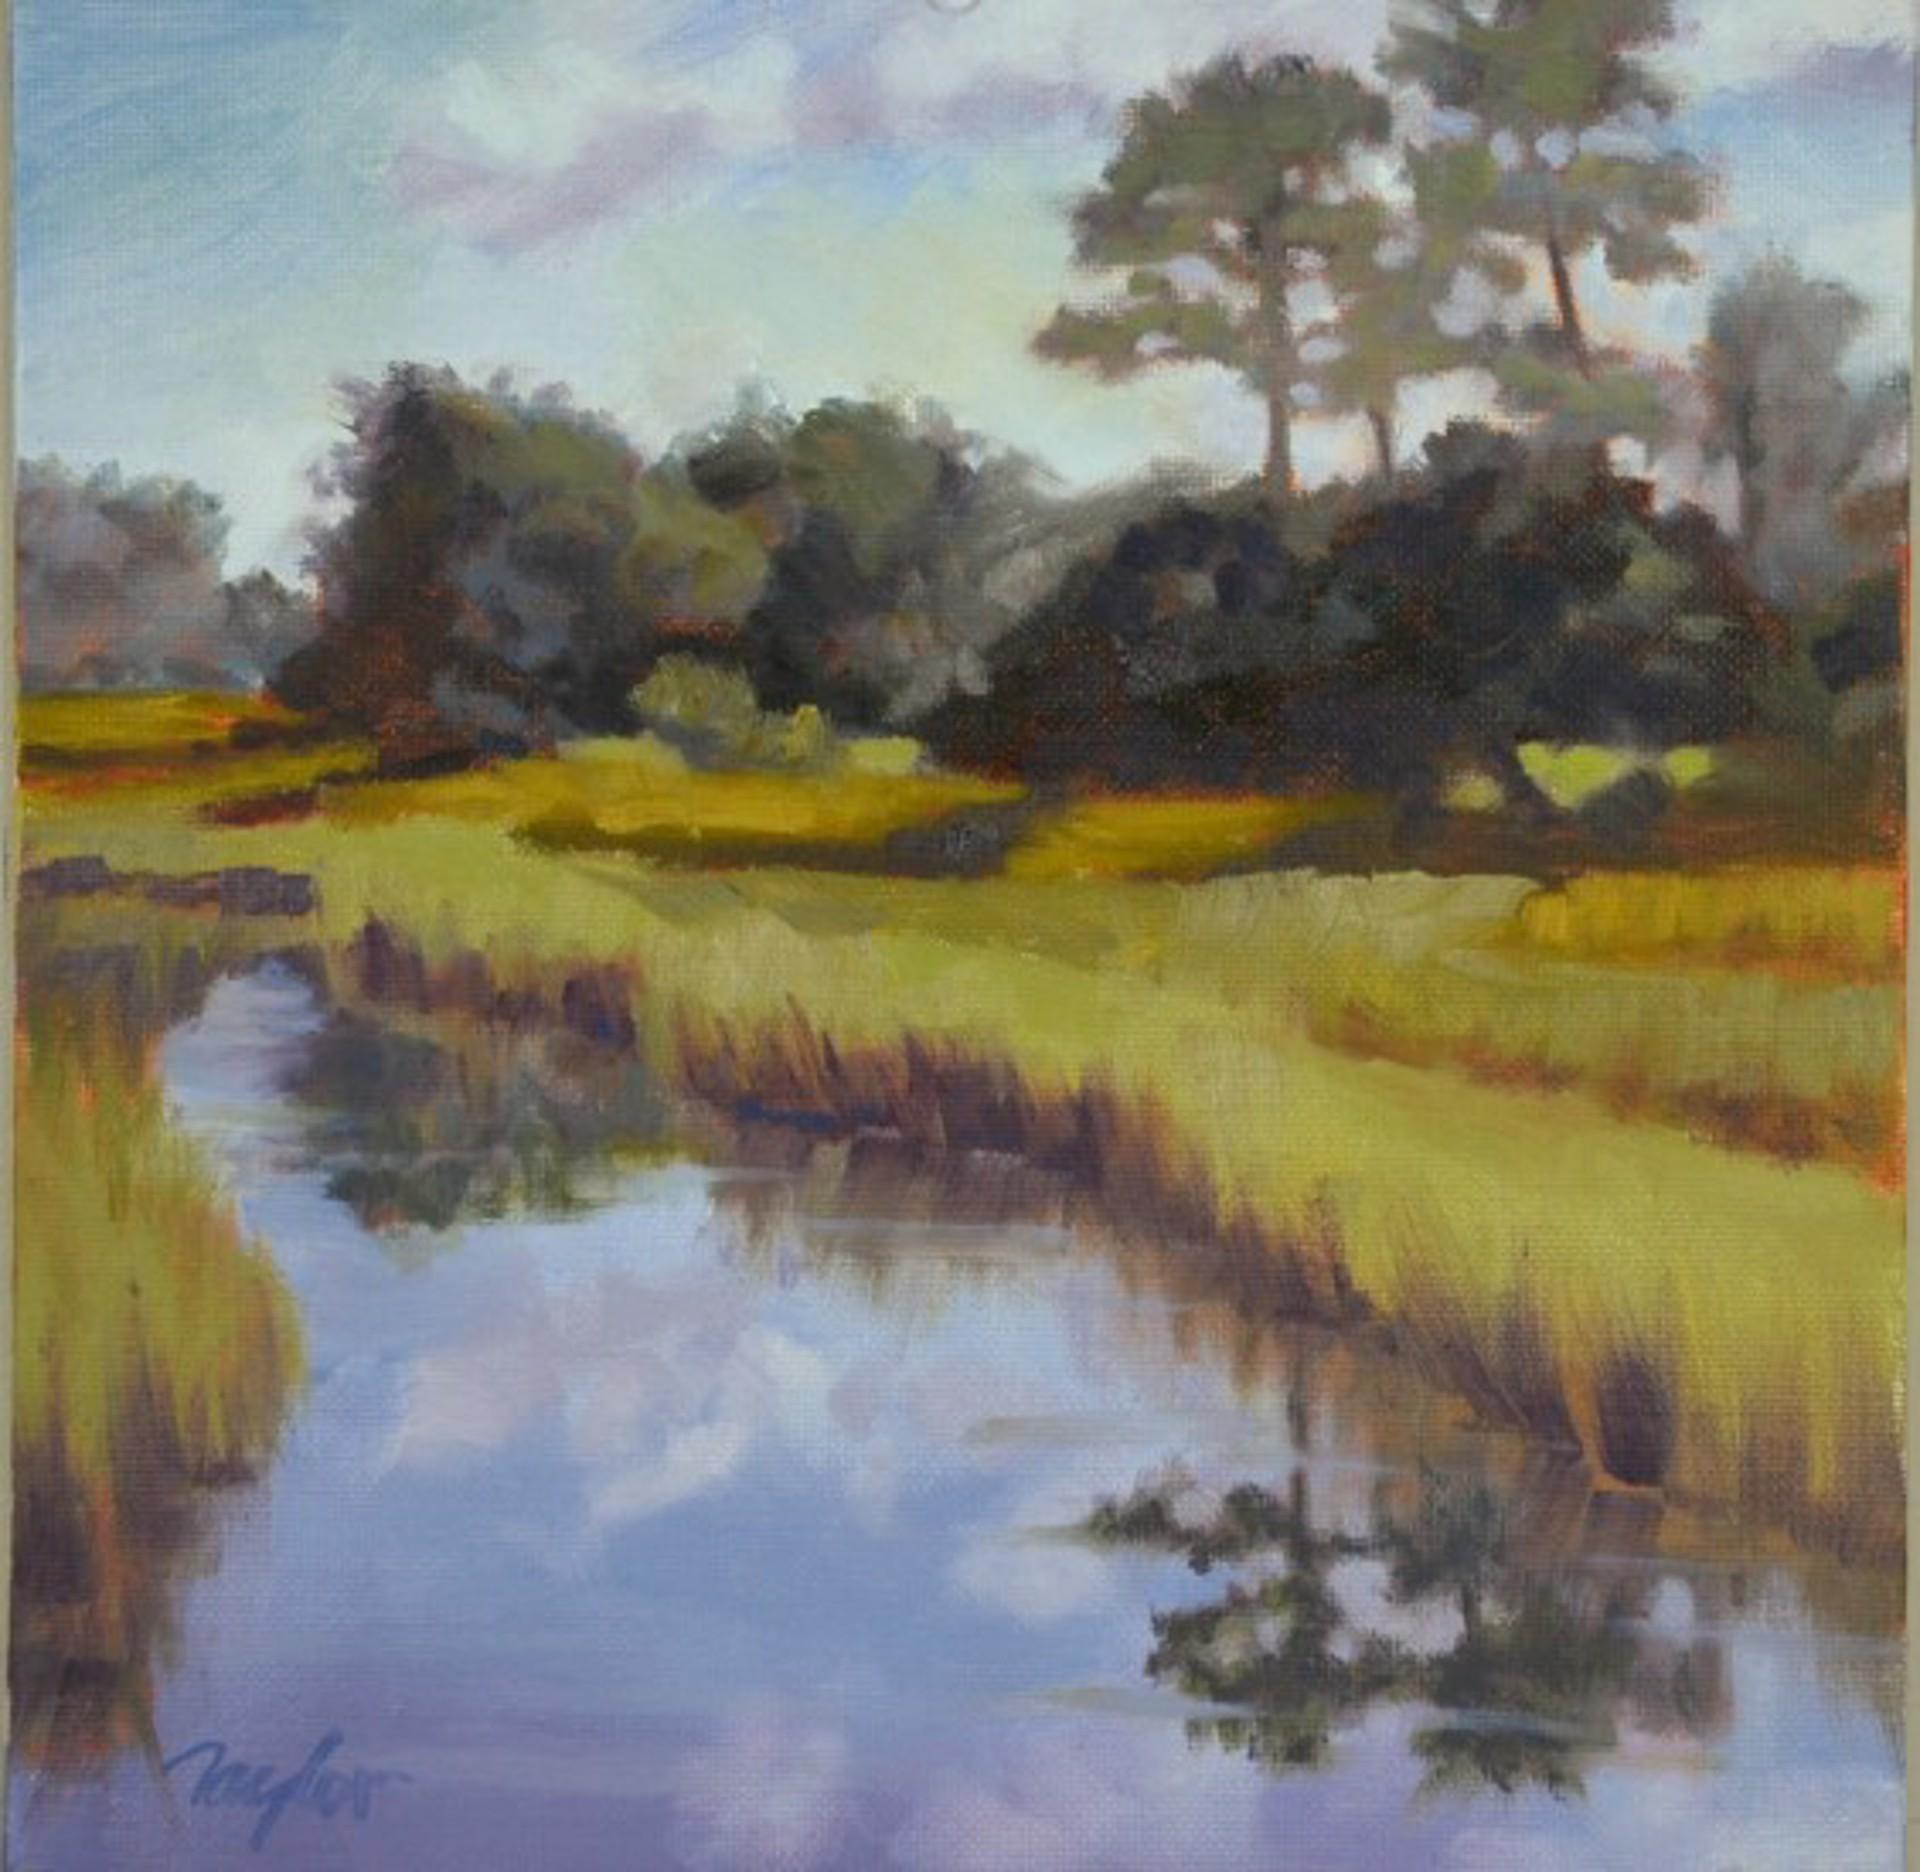 Reflections on a Sunny Day by Nancy Taylor